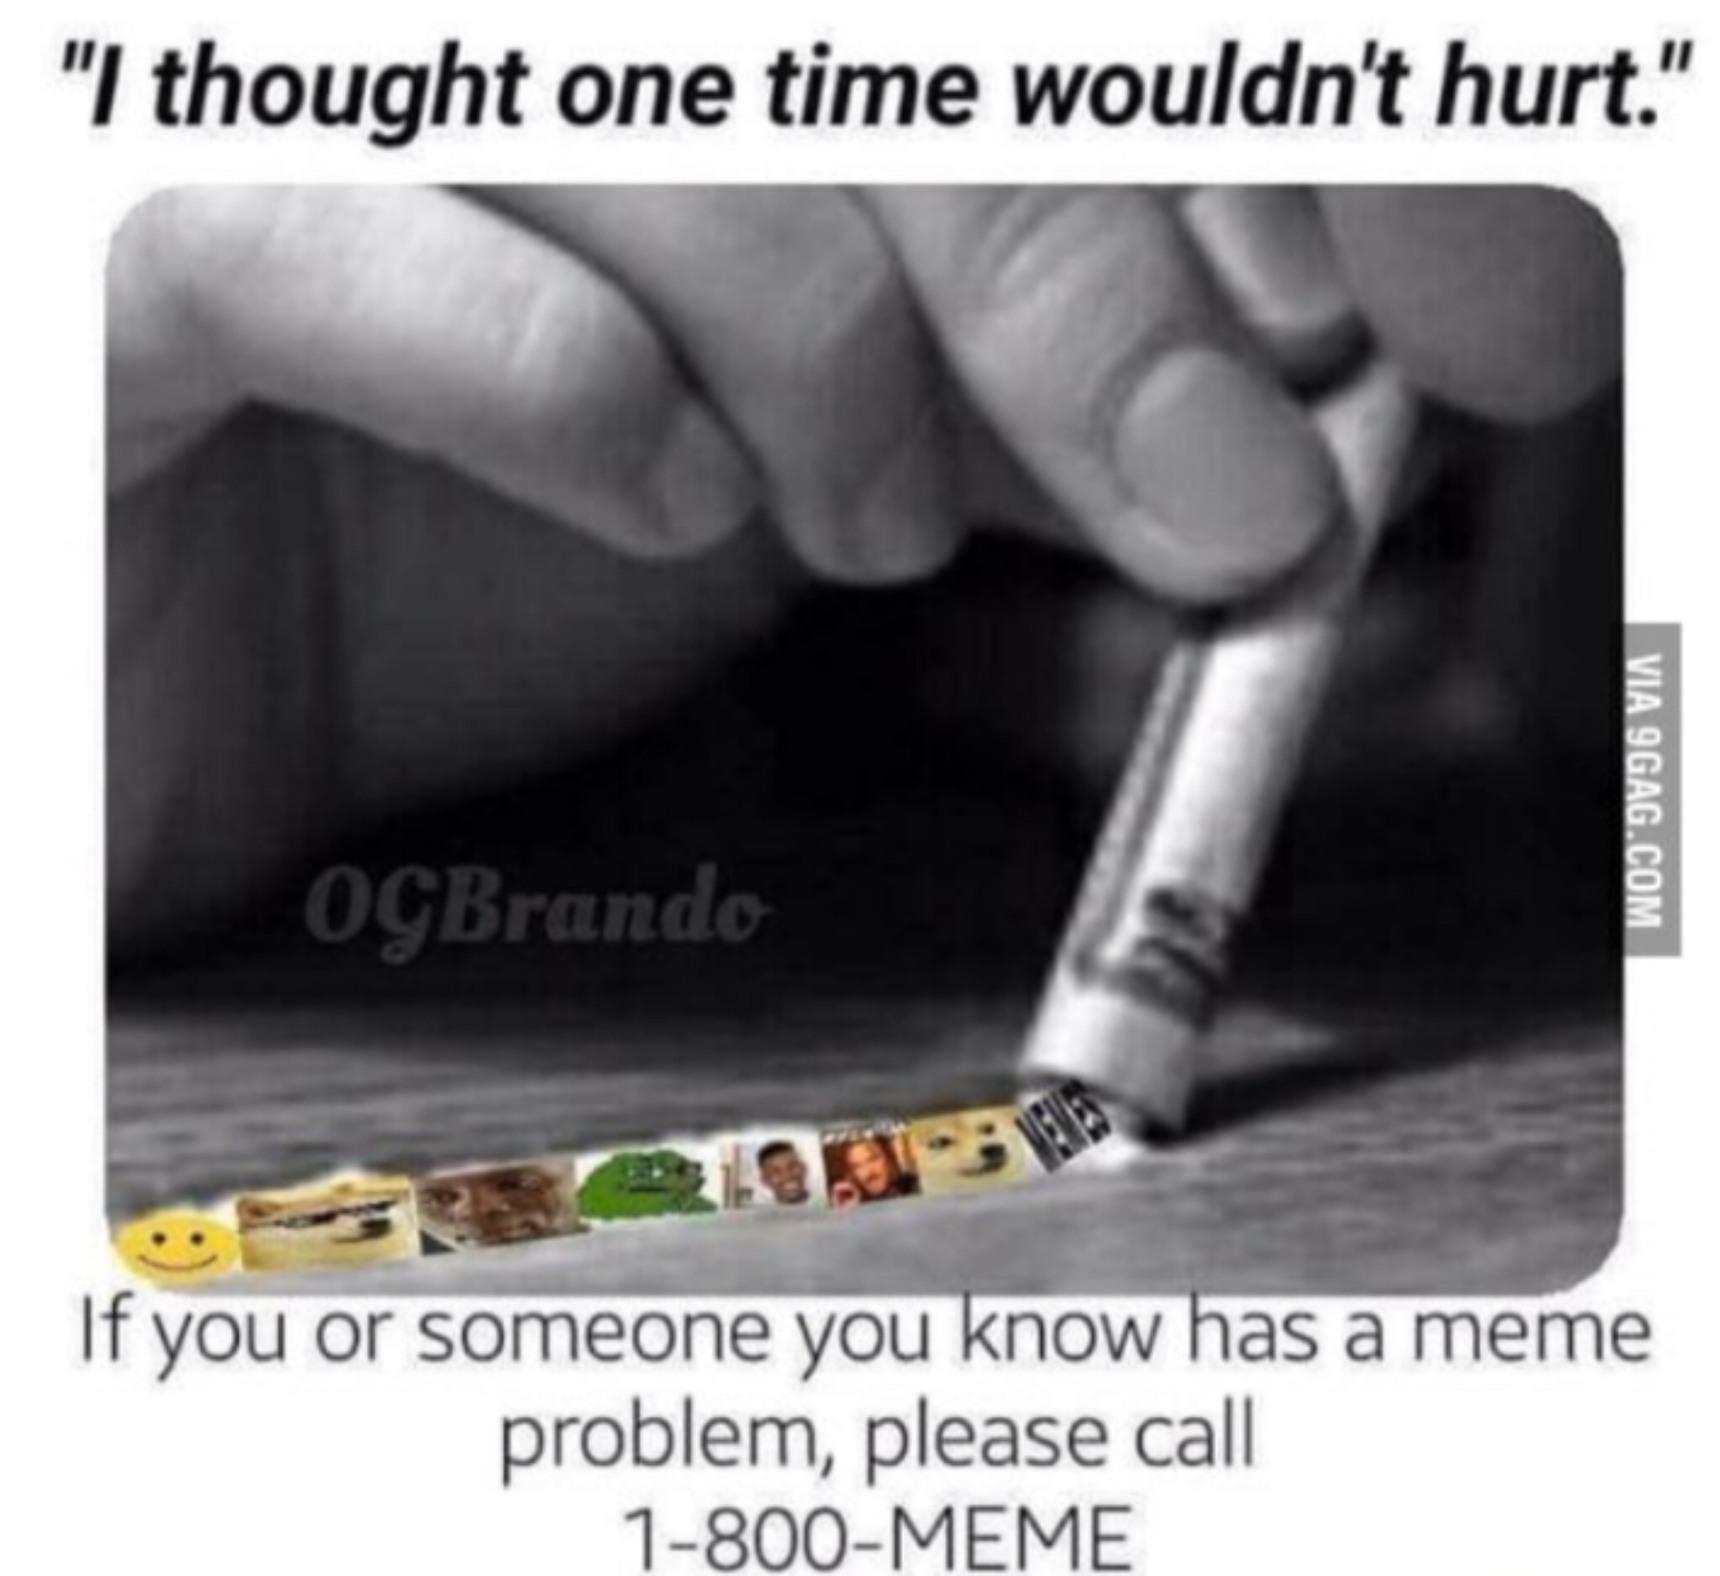 1-800-meme